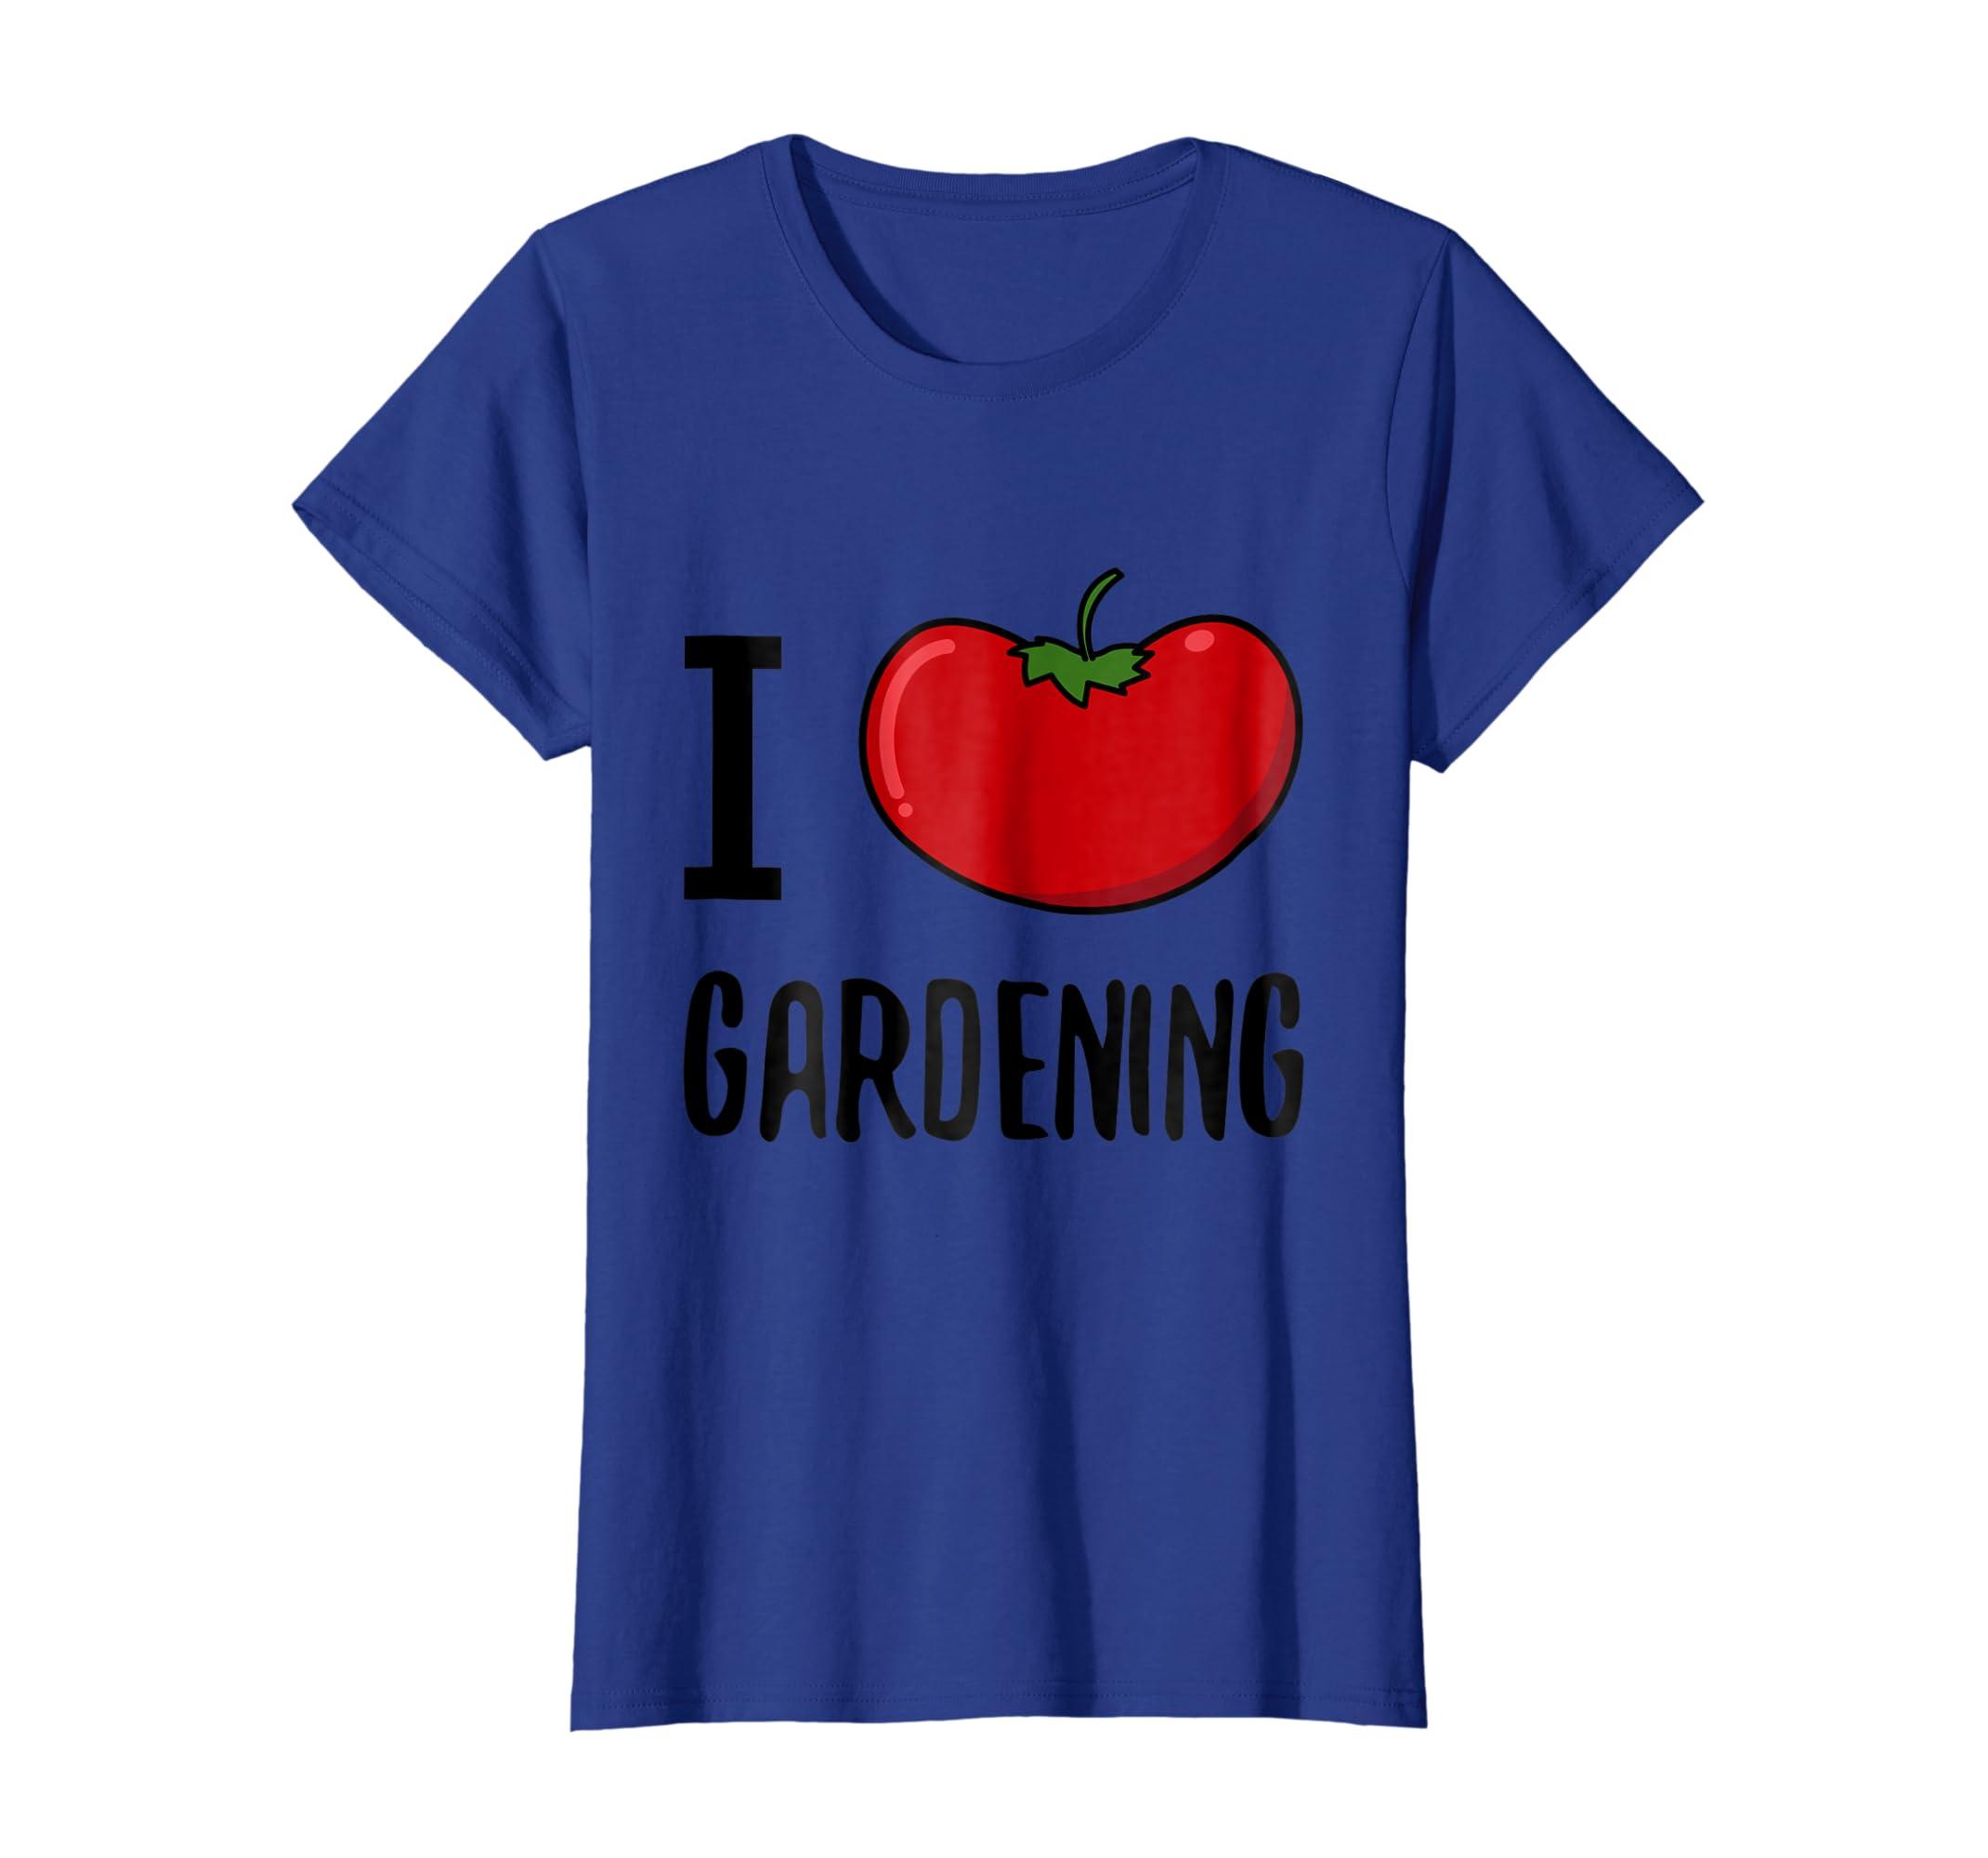 d9ad7f3a Amazon.com: Funny I Love Gardening T-Shirt I Tomato Plant Garden Tee:  Clothing